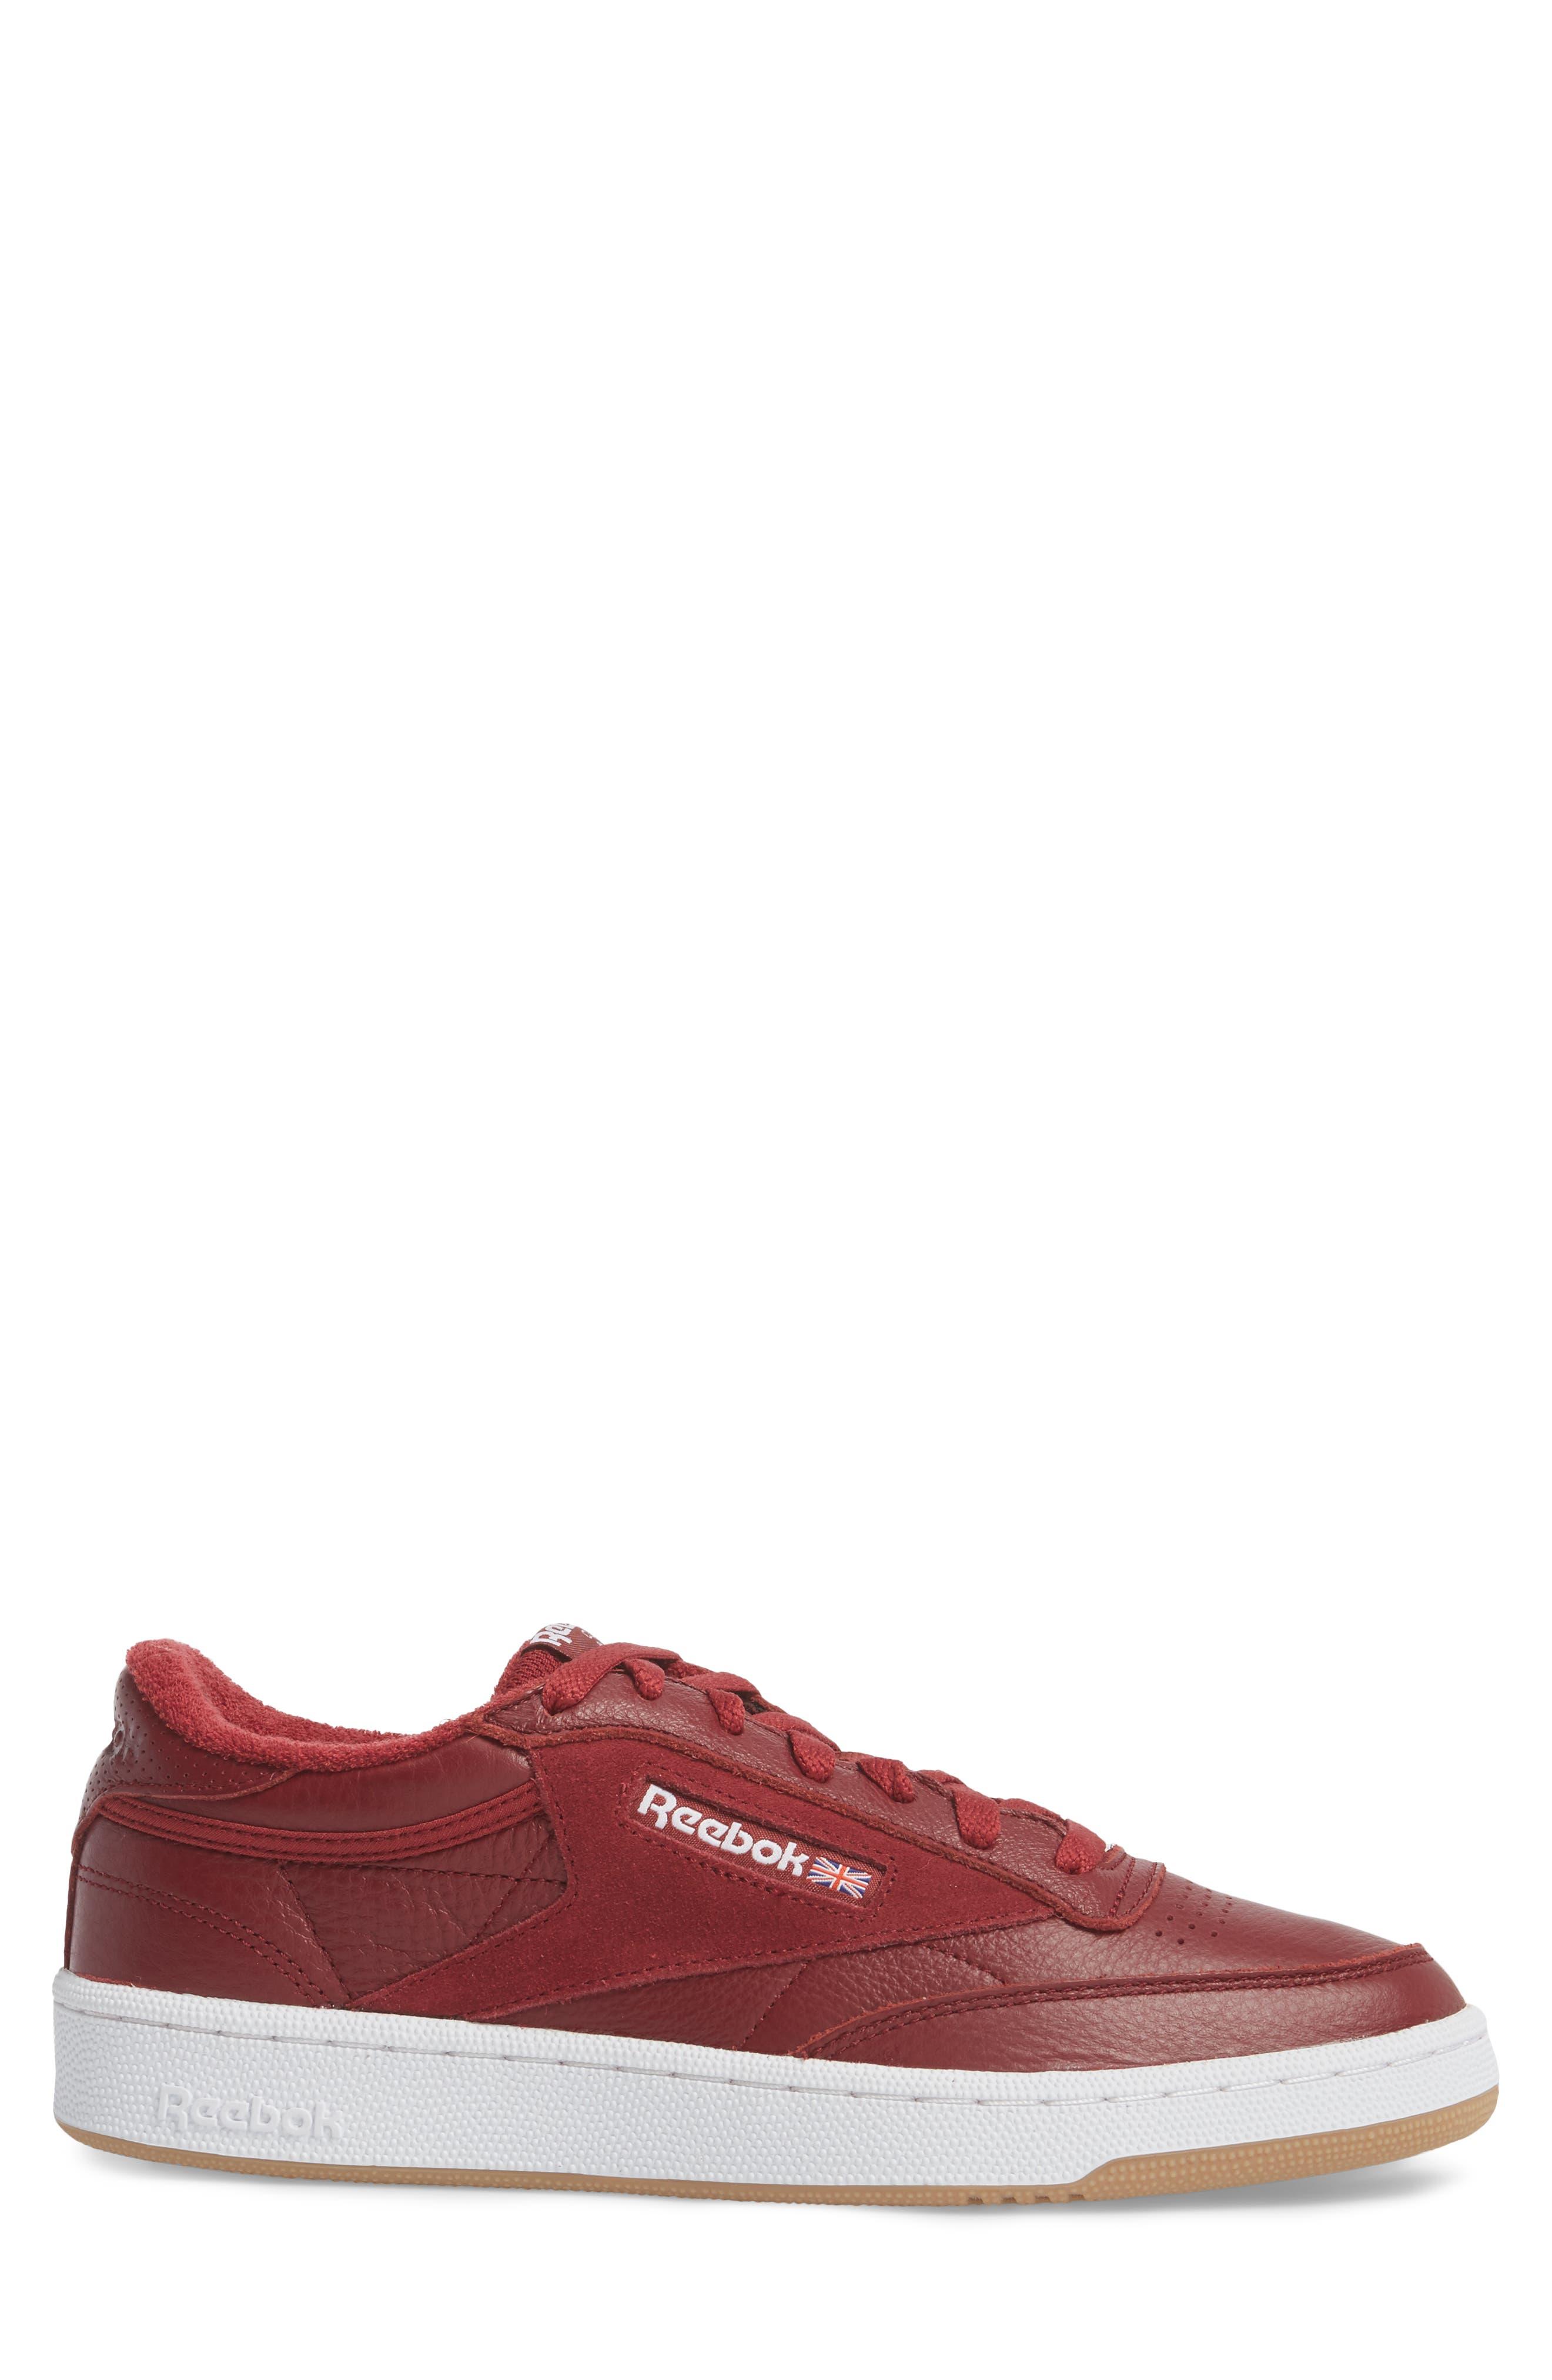 Club C 85 ESTL Sneaker,                             Alternate thumbnail 6, color,